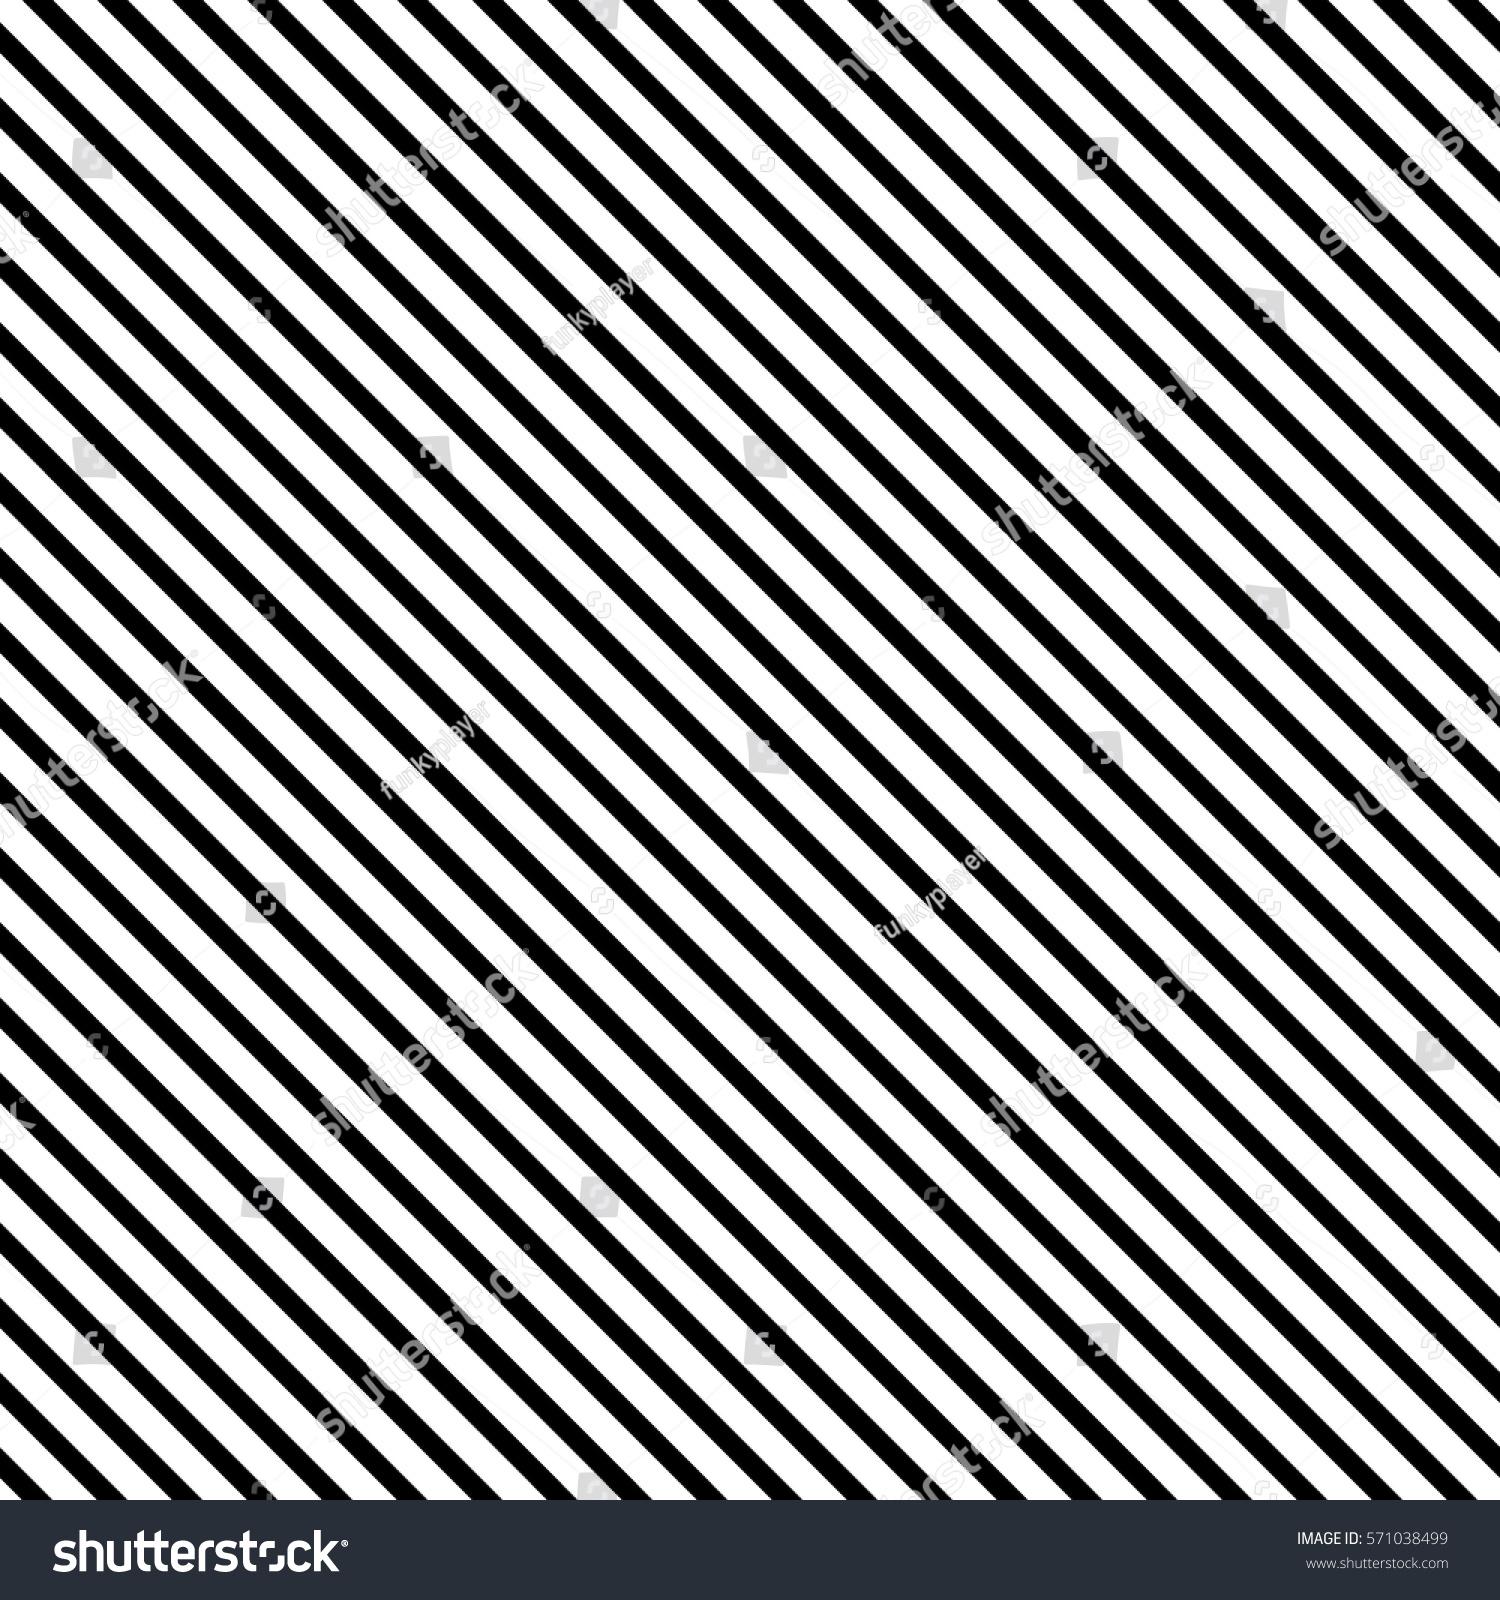 Black Diagonal Lines Striped Wallpaper Seamless Stock Vector 2018